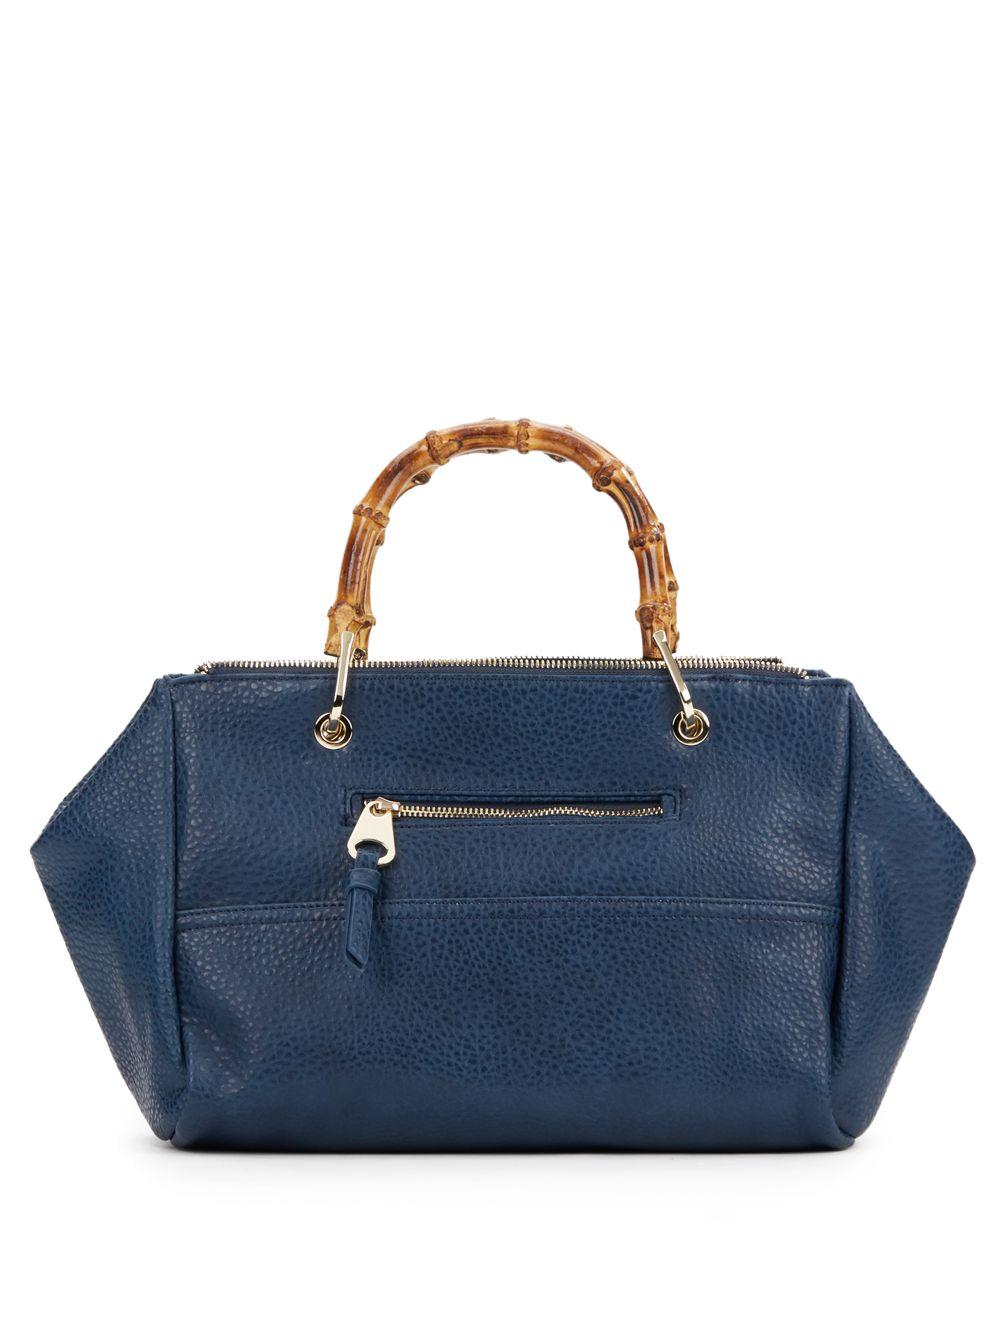 5f91c8c78a4c Lyst - Sondra Roberts Bamboo Handle Faux Leather Handbag in Blue